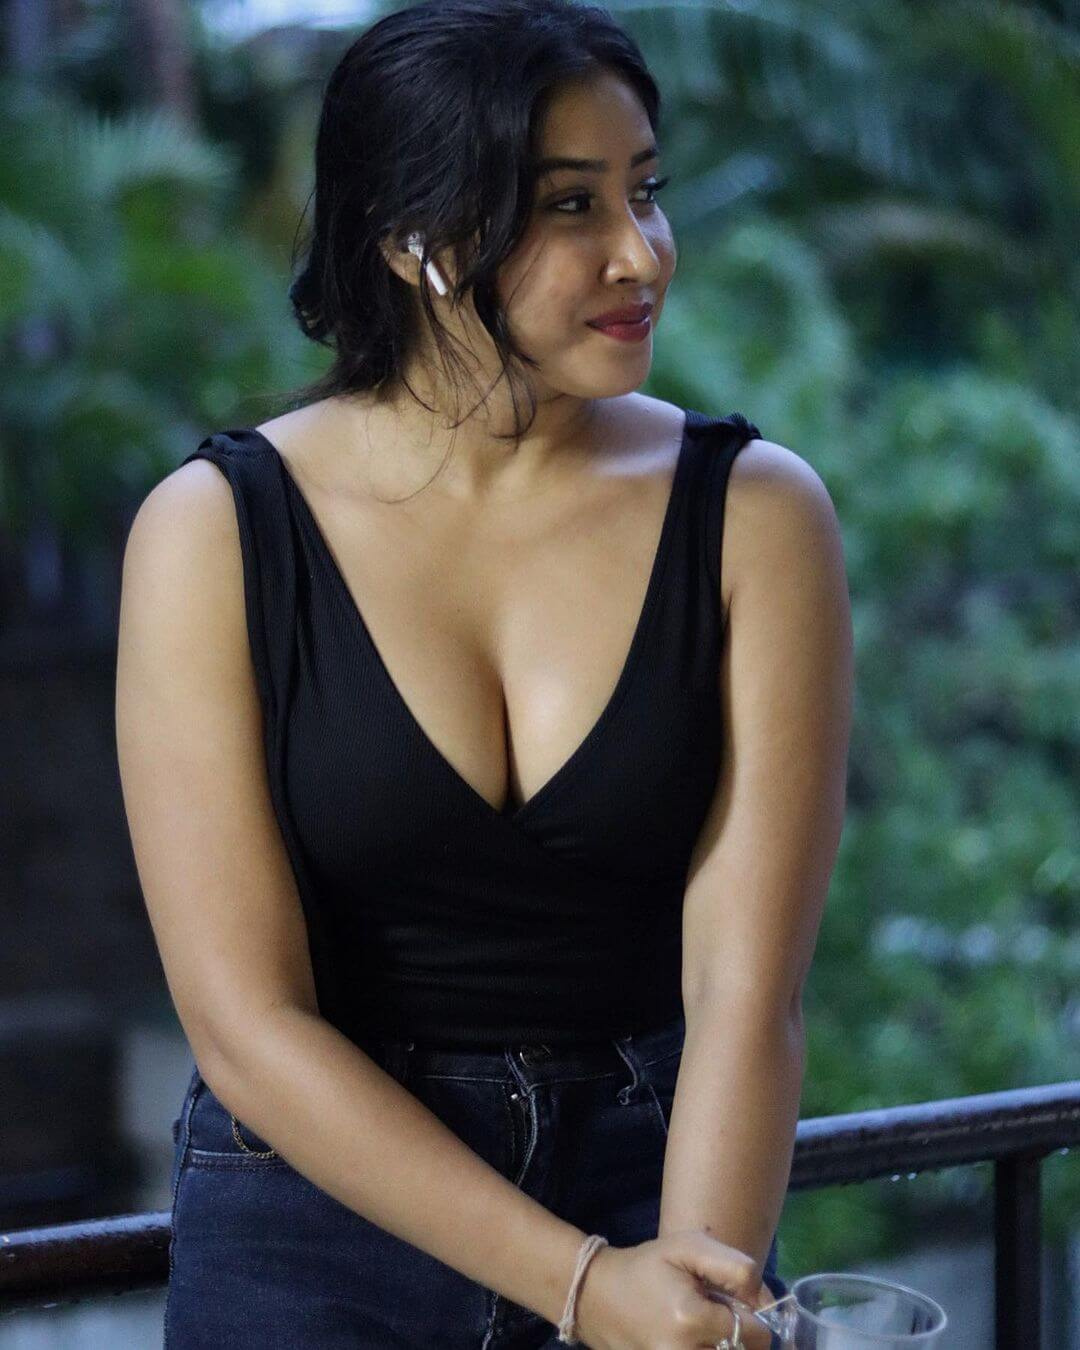 Sofia Ansati wiki